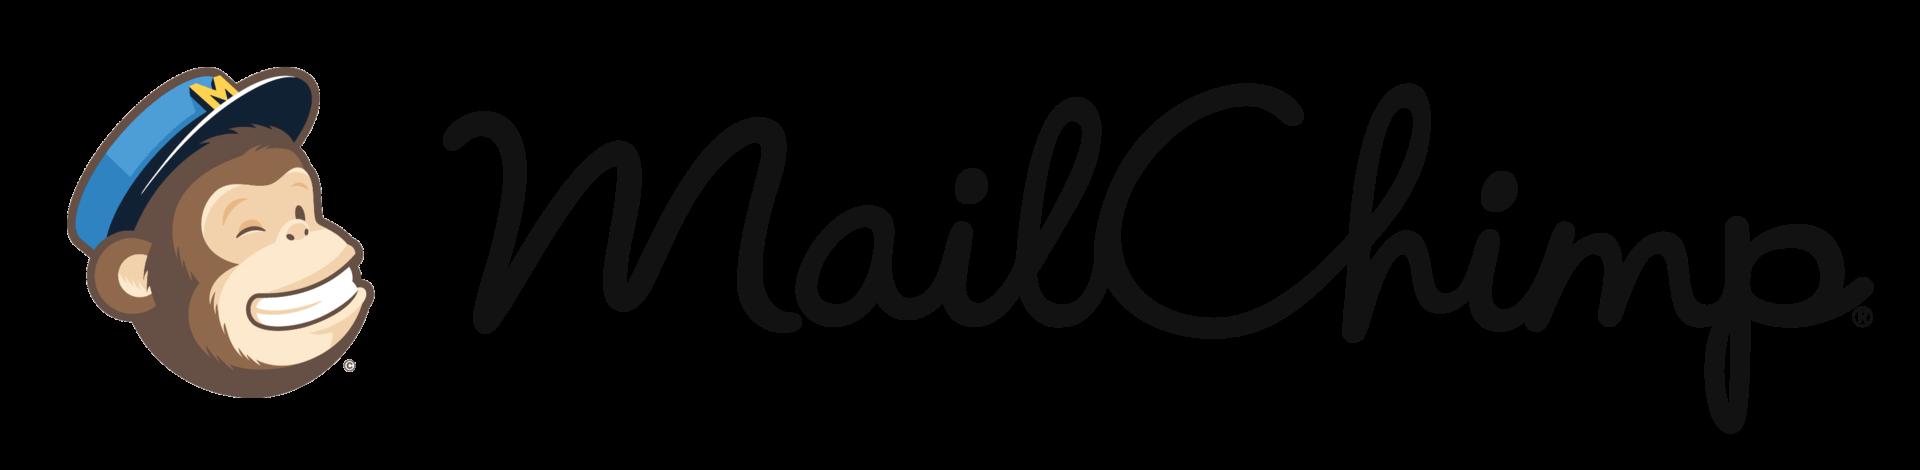 Using MailChimp: Better newsletters